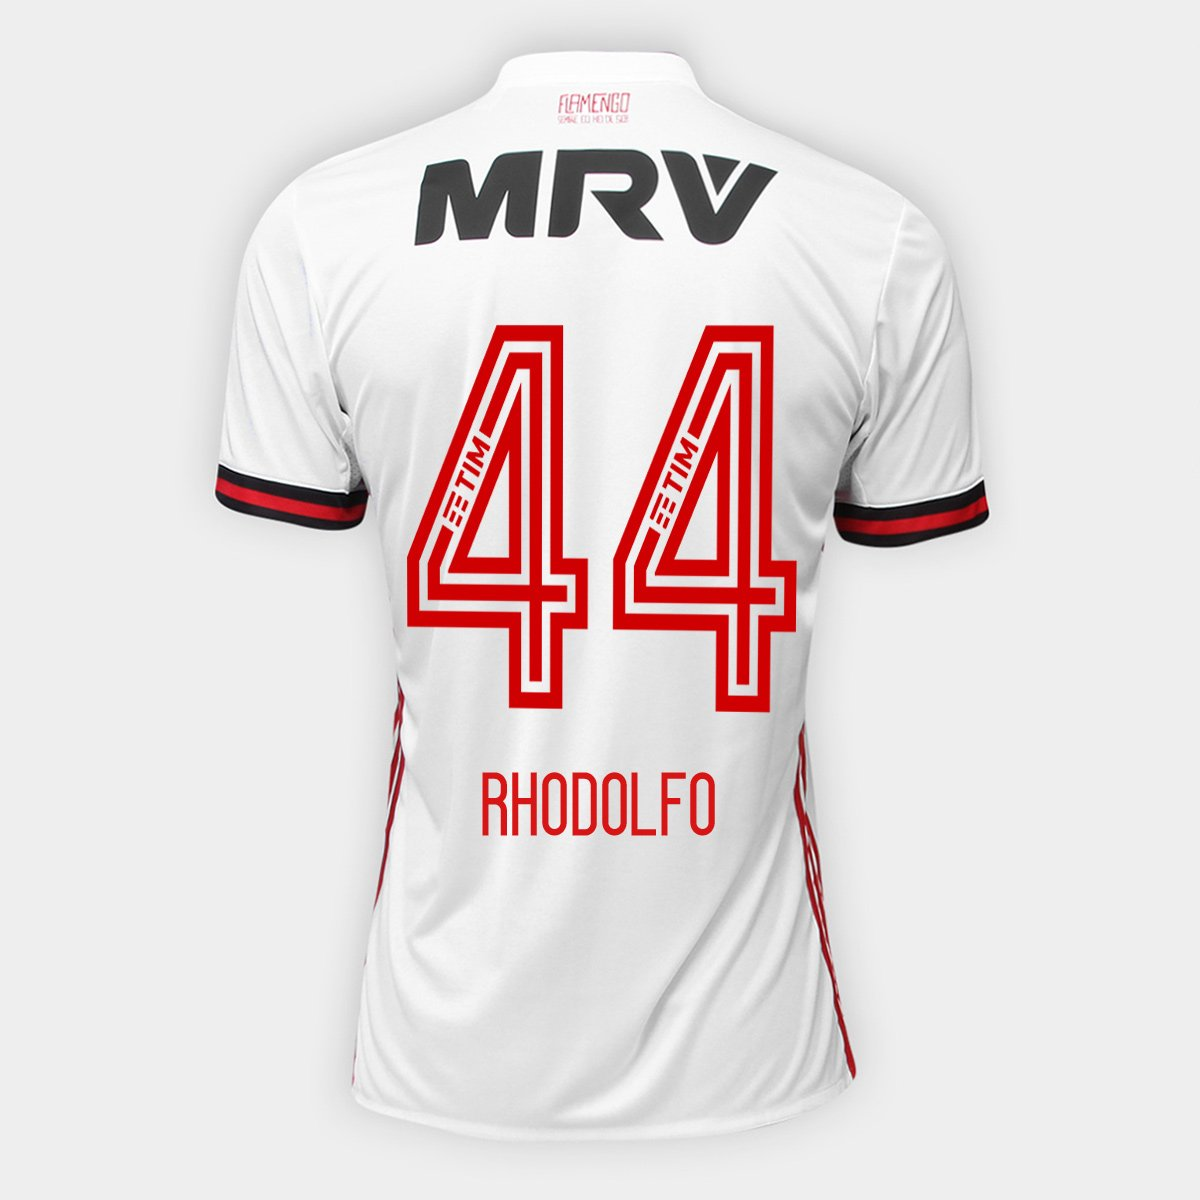 Camisa Flamengo II 17 18 N° 44 - Rhodolfo Torcedor Adidas Masculina - Compre  Agora  165b5005f3fa5